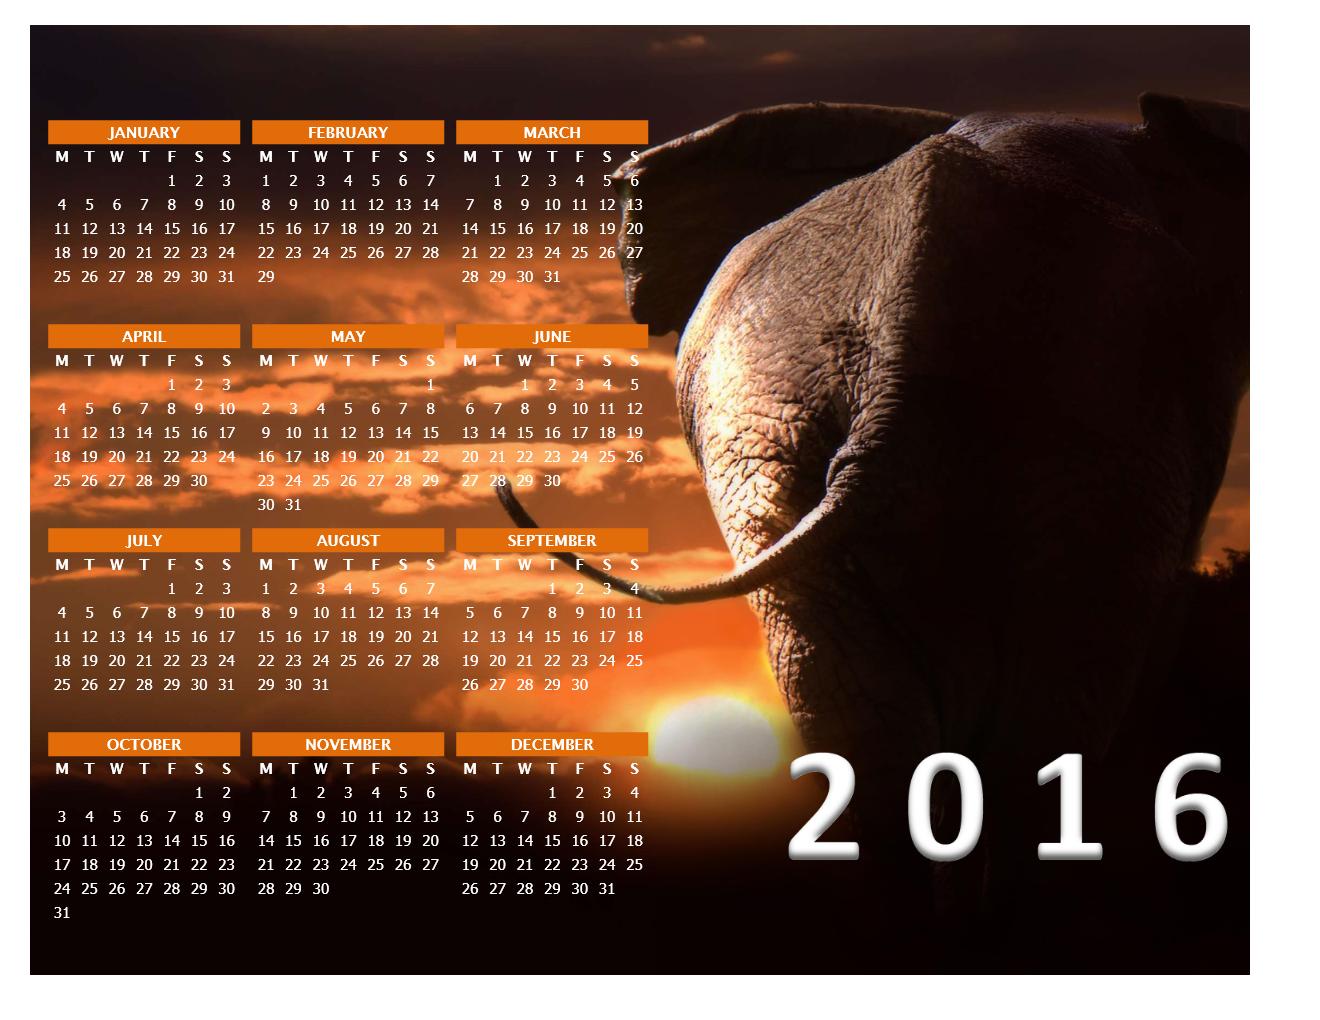 2016 Photo Calendar Model 3